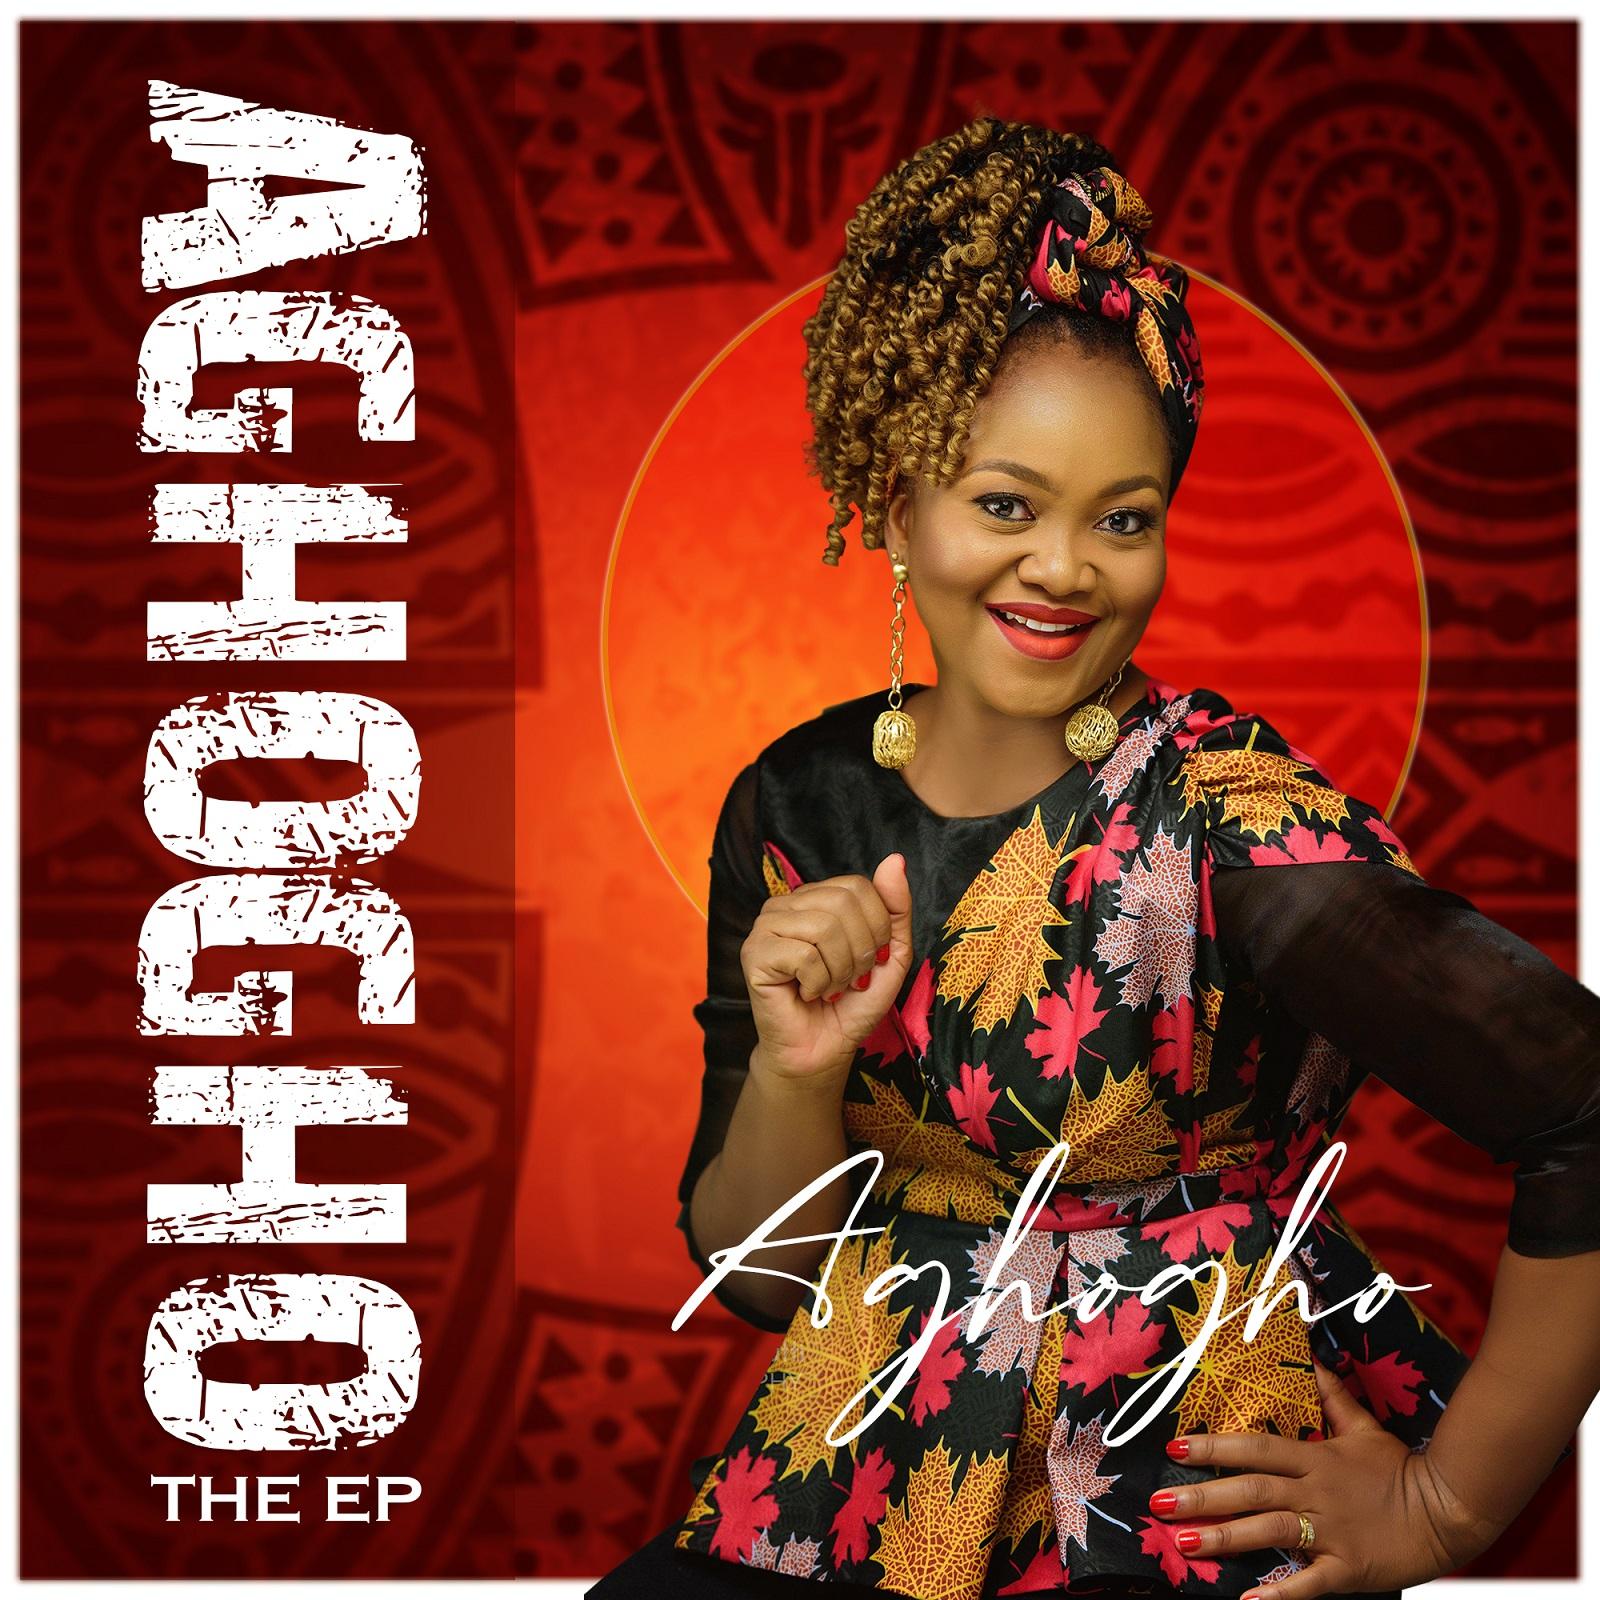 Aghogho the EP by Aghogho on Apple Music Image